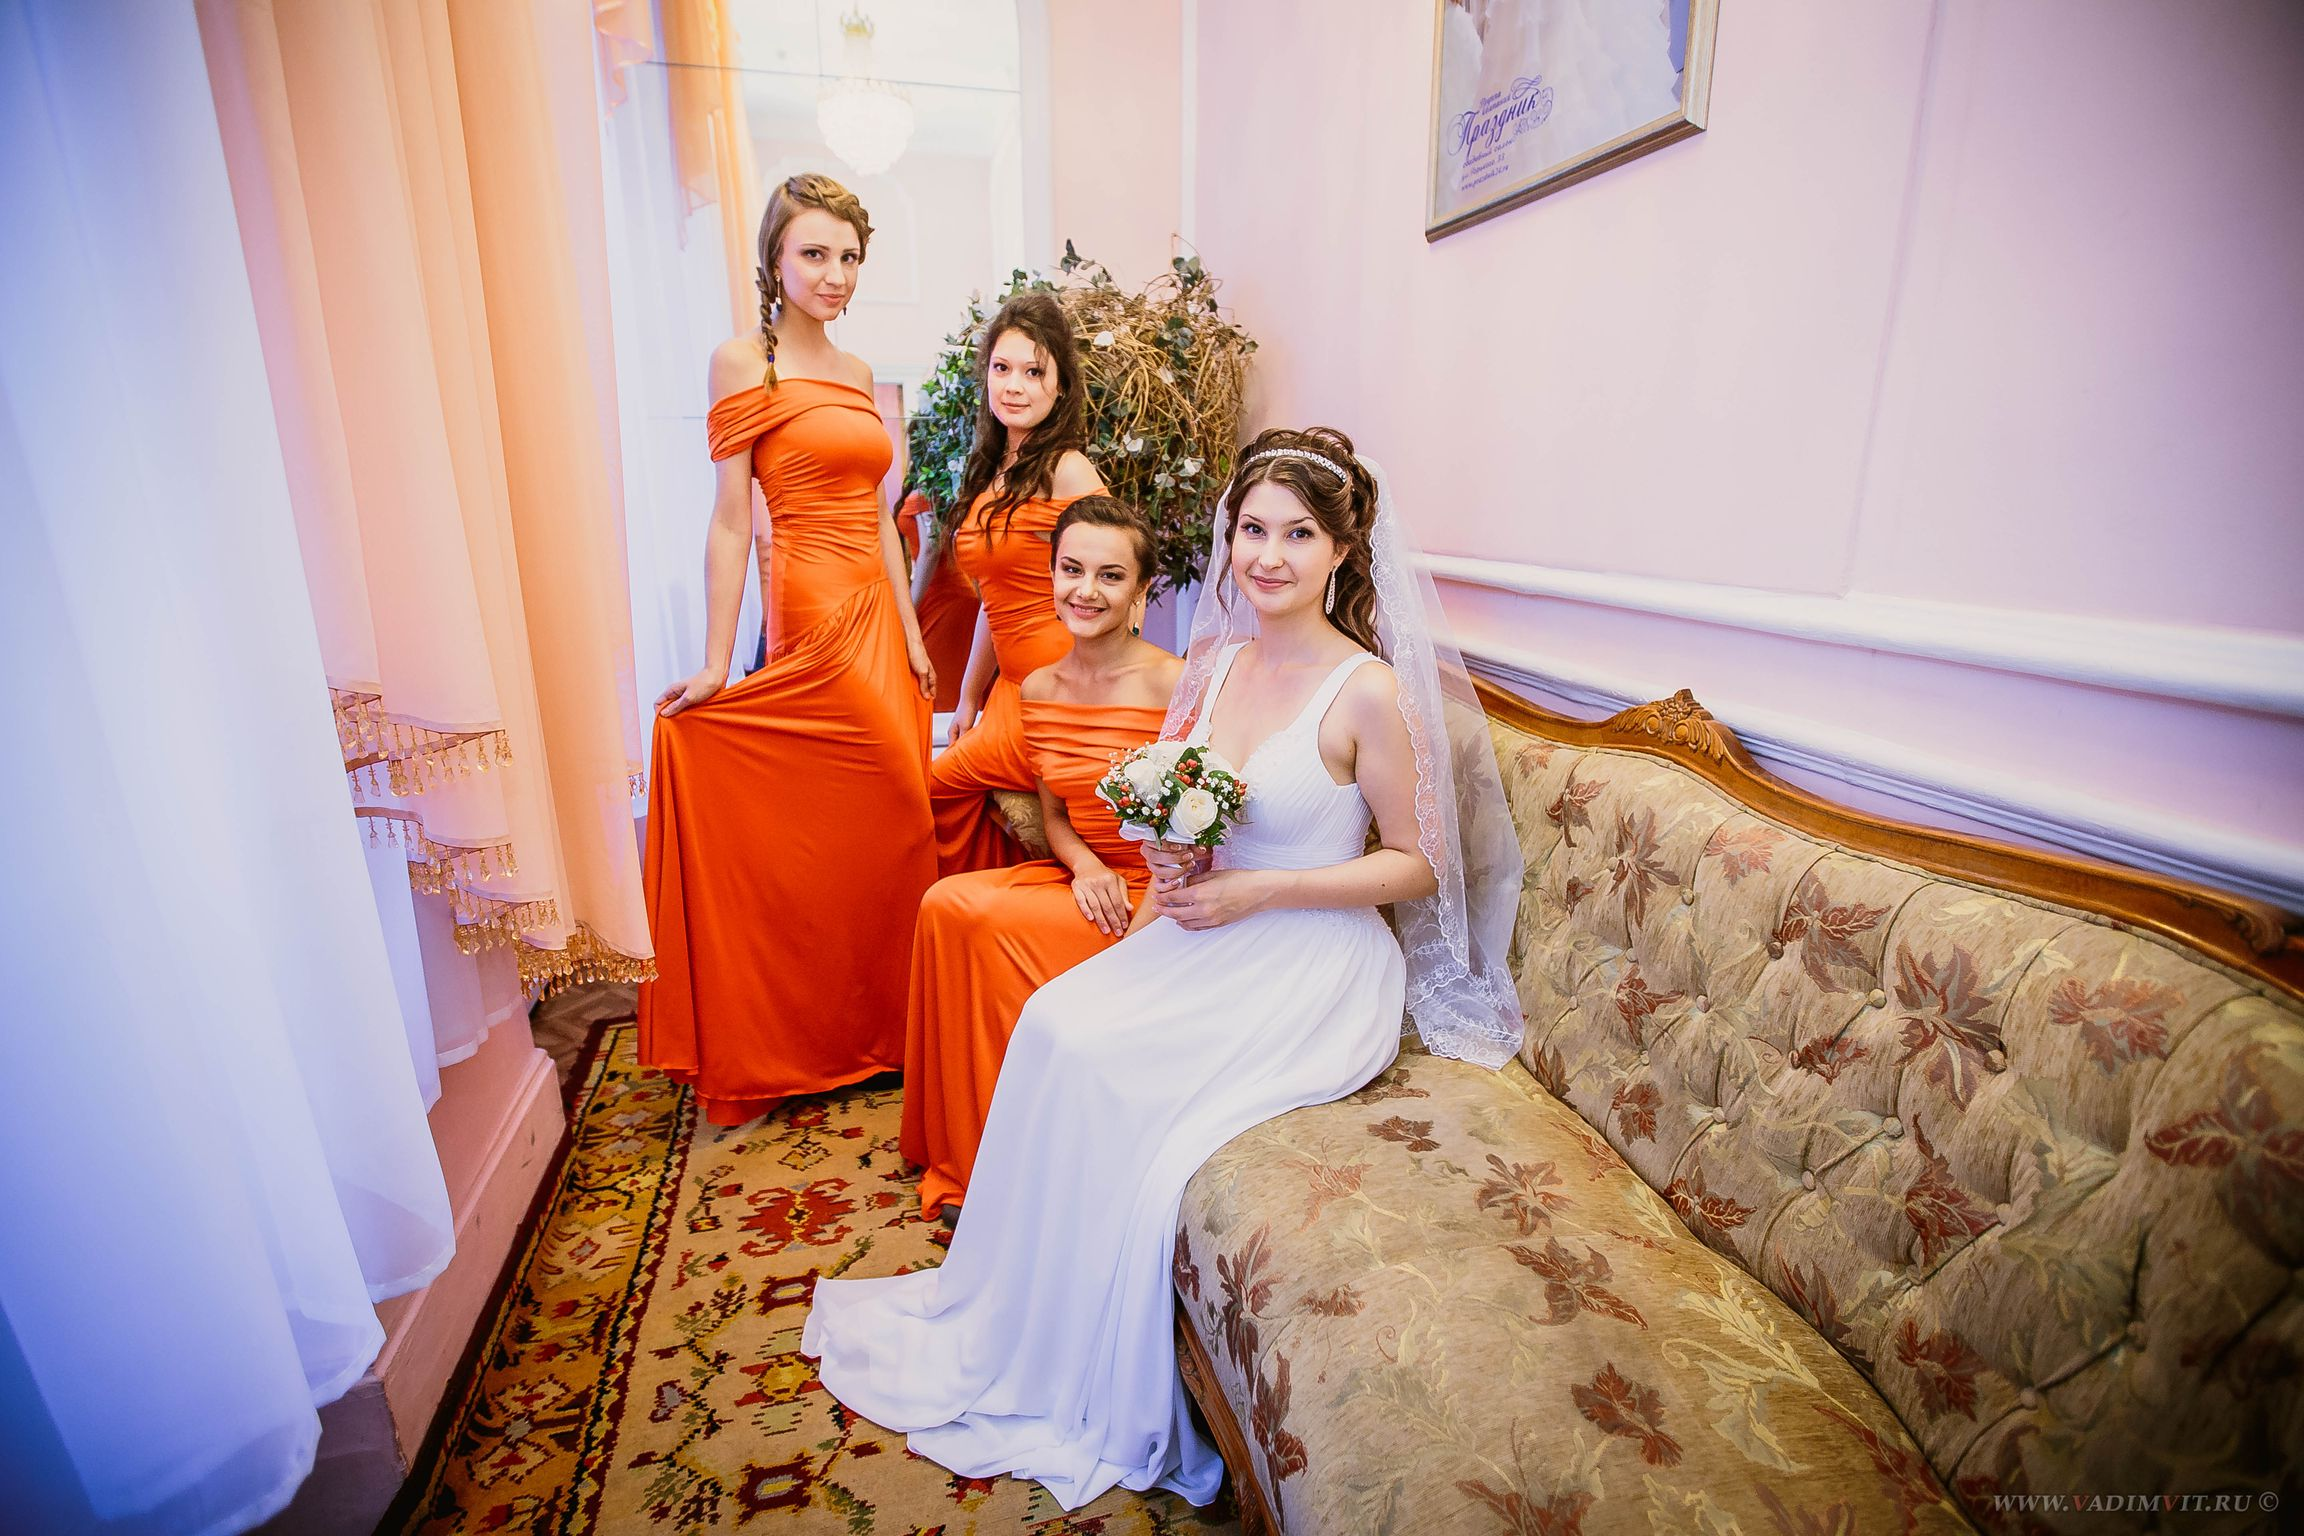 Комната невесты. Дворец бракосочетания